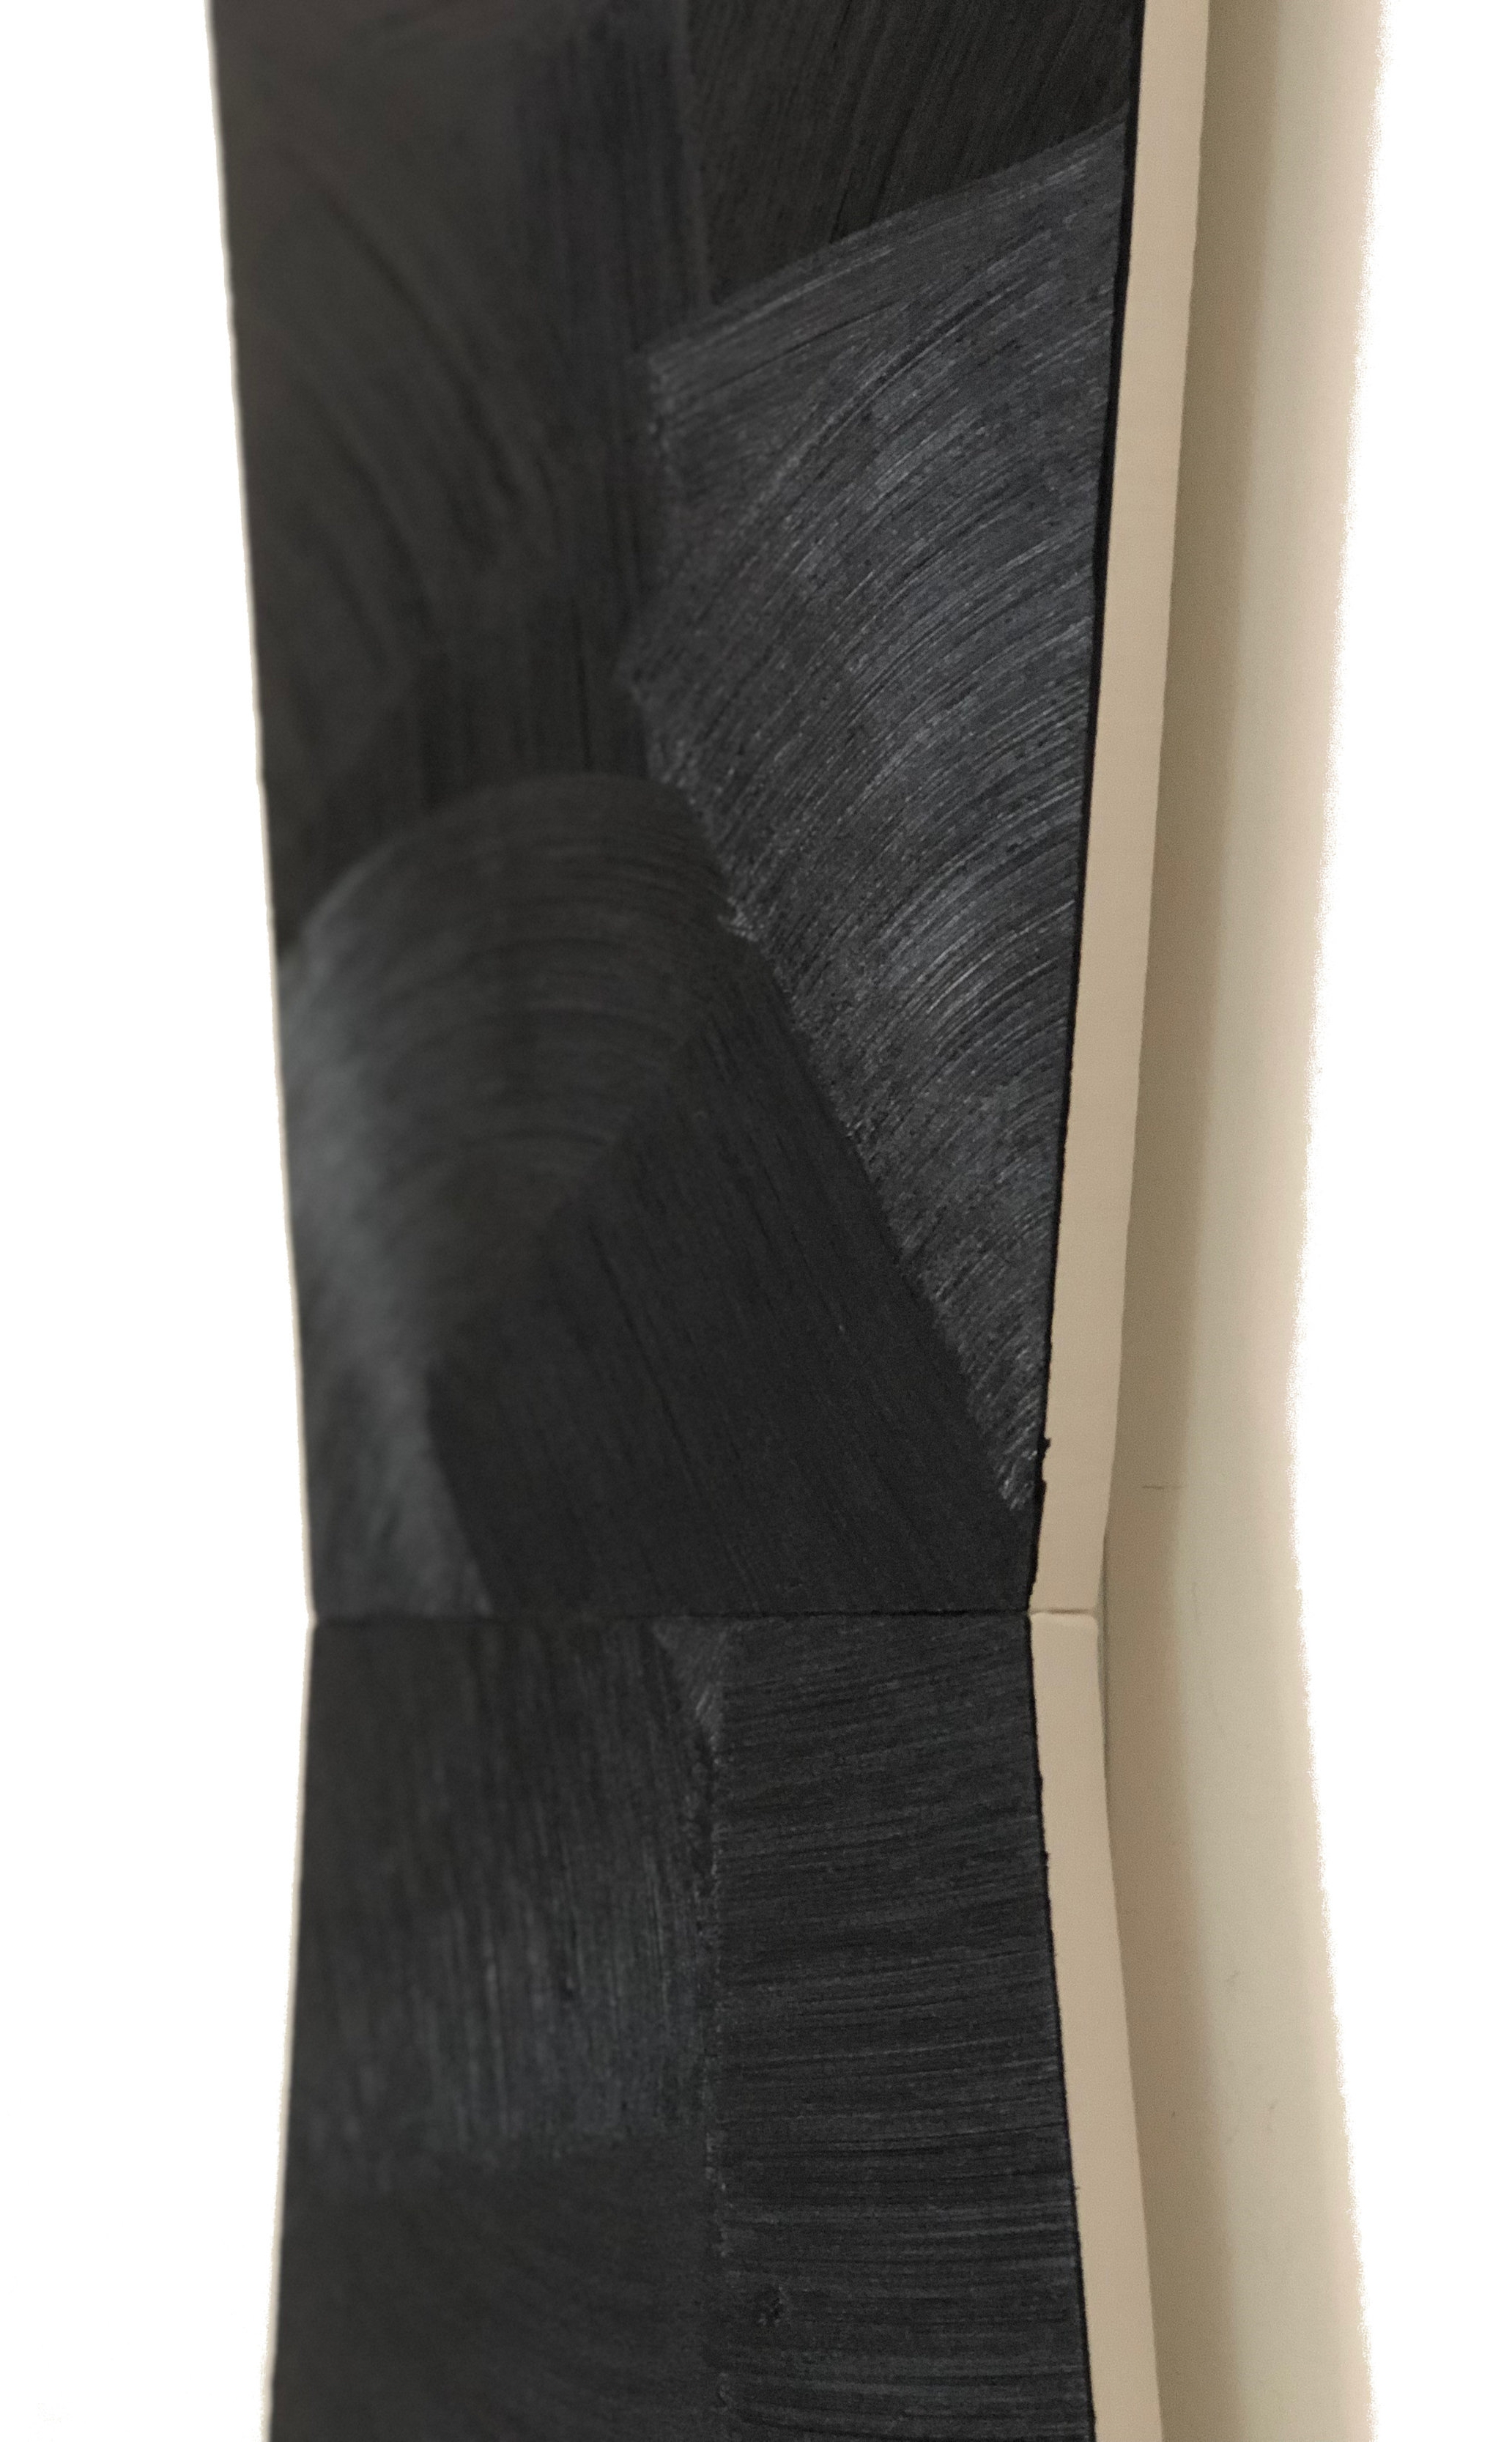 "18-01 (detail) acrylic on muslin over mdf 78"" x 12.25"" 2018"